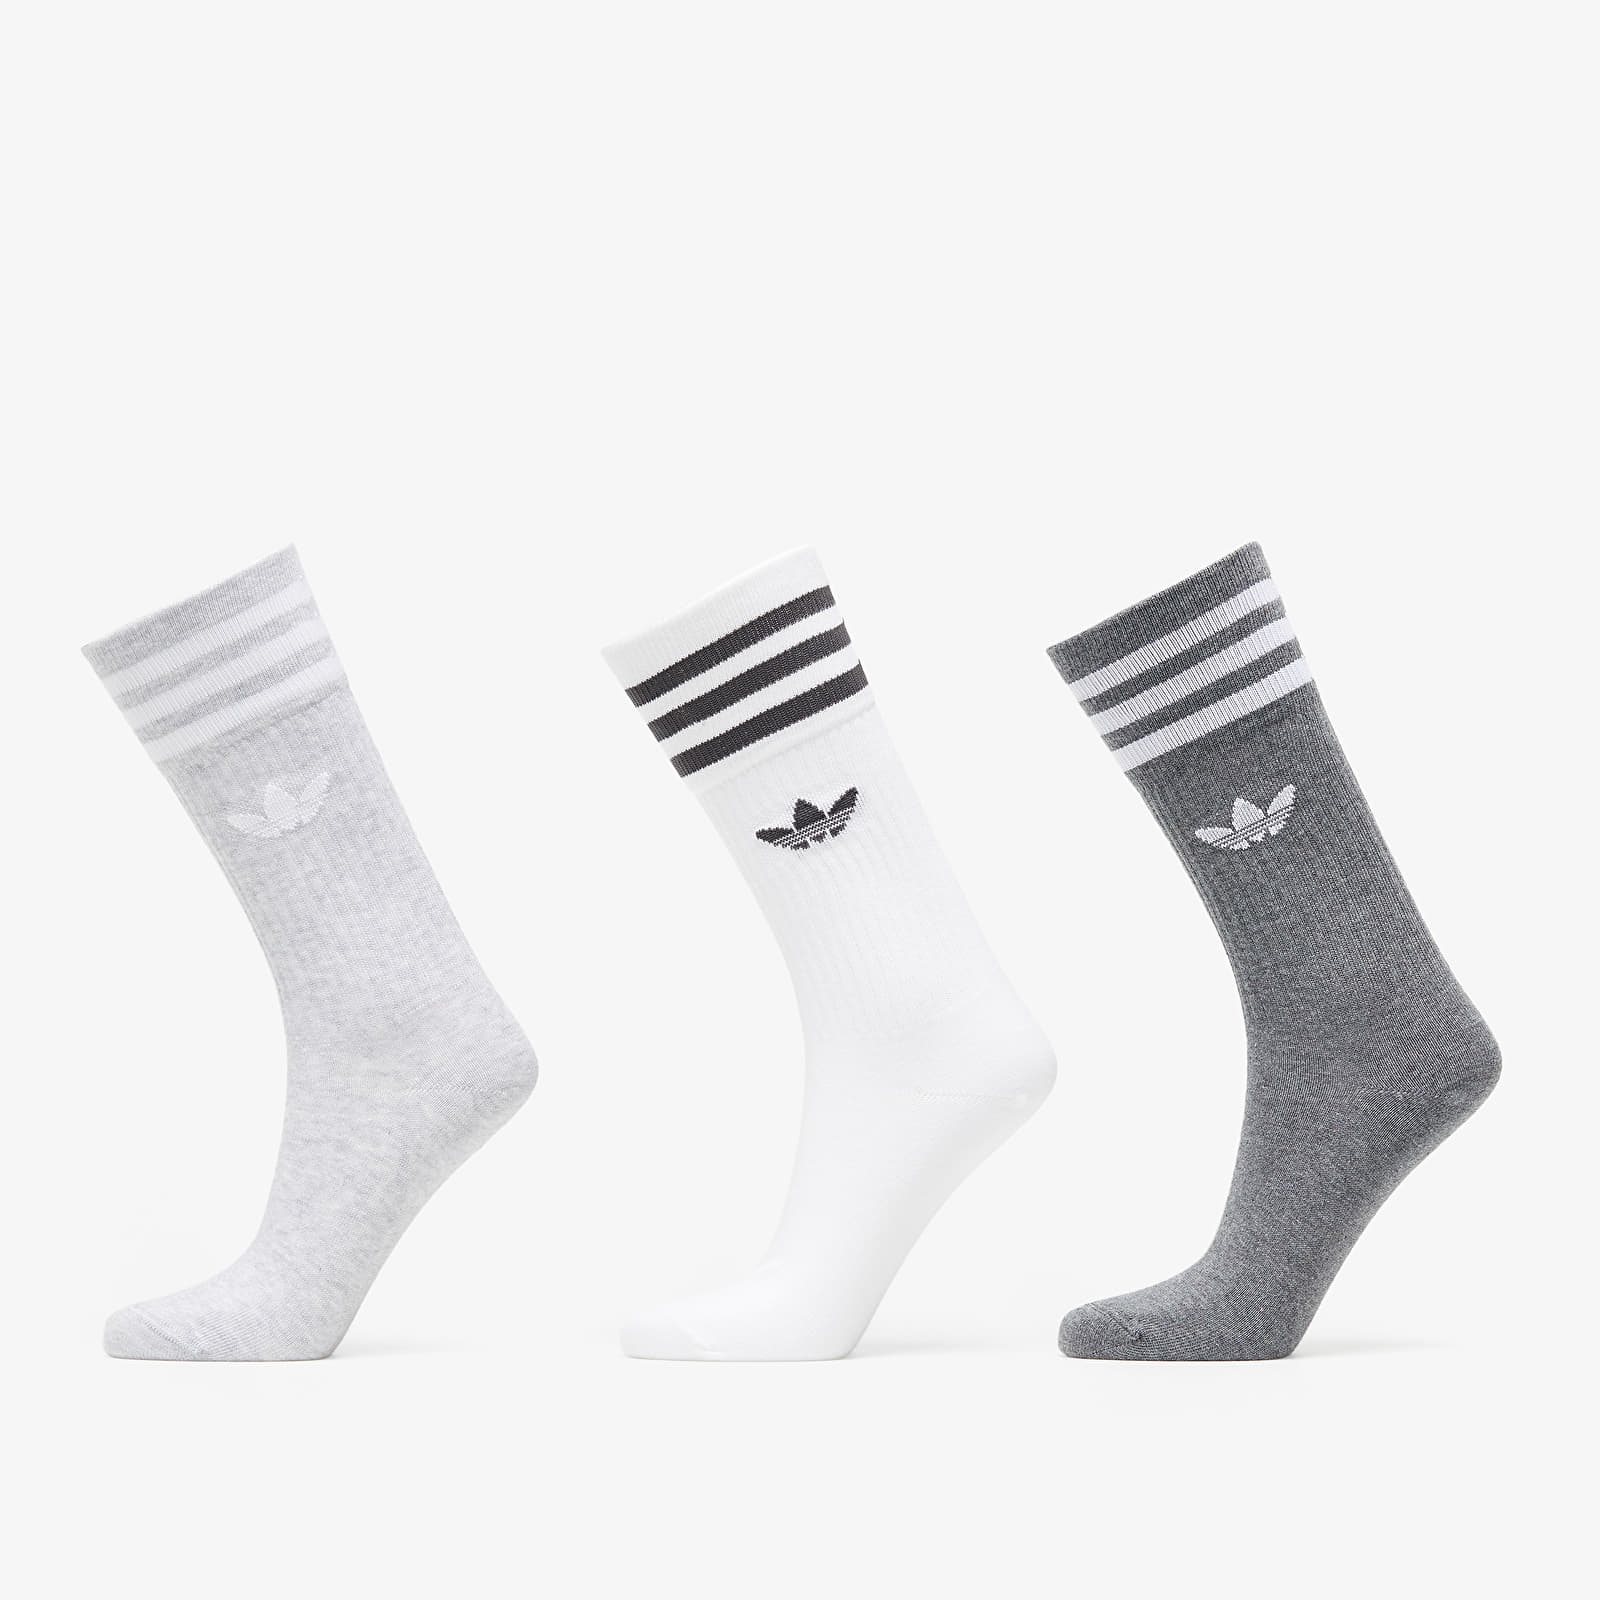 adidas Solid Crew Sock 3 Pack White/ Lgreyh/ Dgreyh EUR 35-38